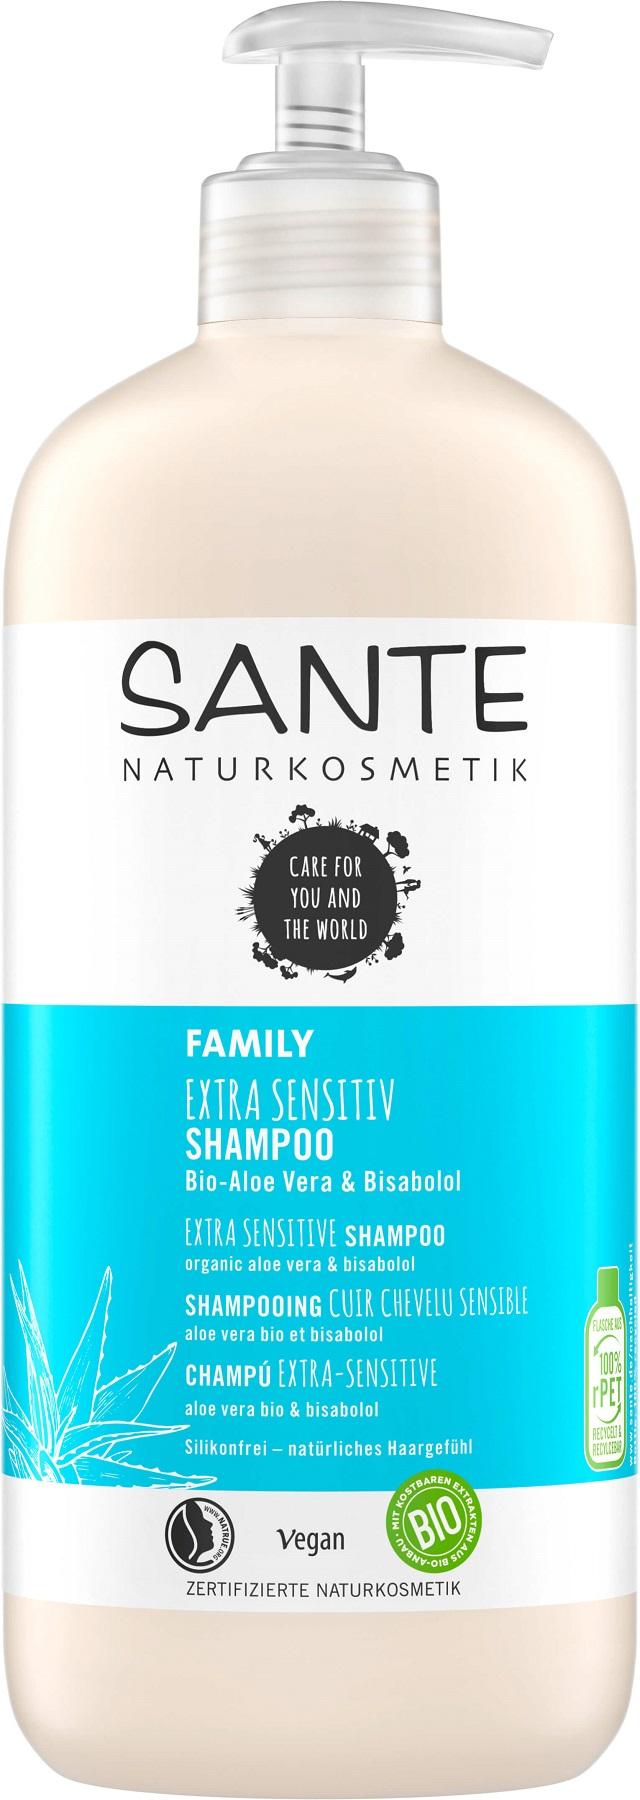 Sante Šampón extra sensitive Bio-Aloe Vera a Bisabolol - 500ml 500ml